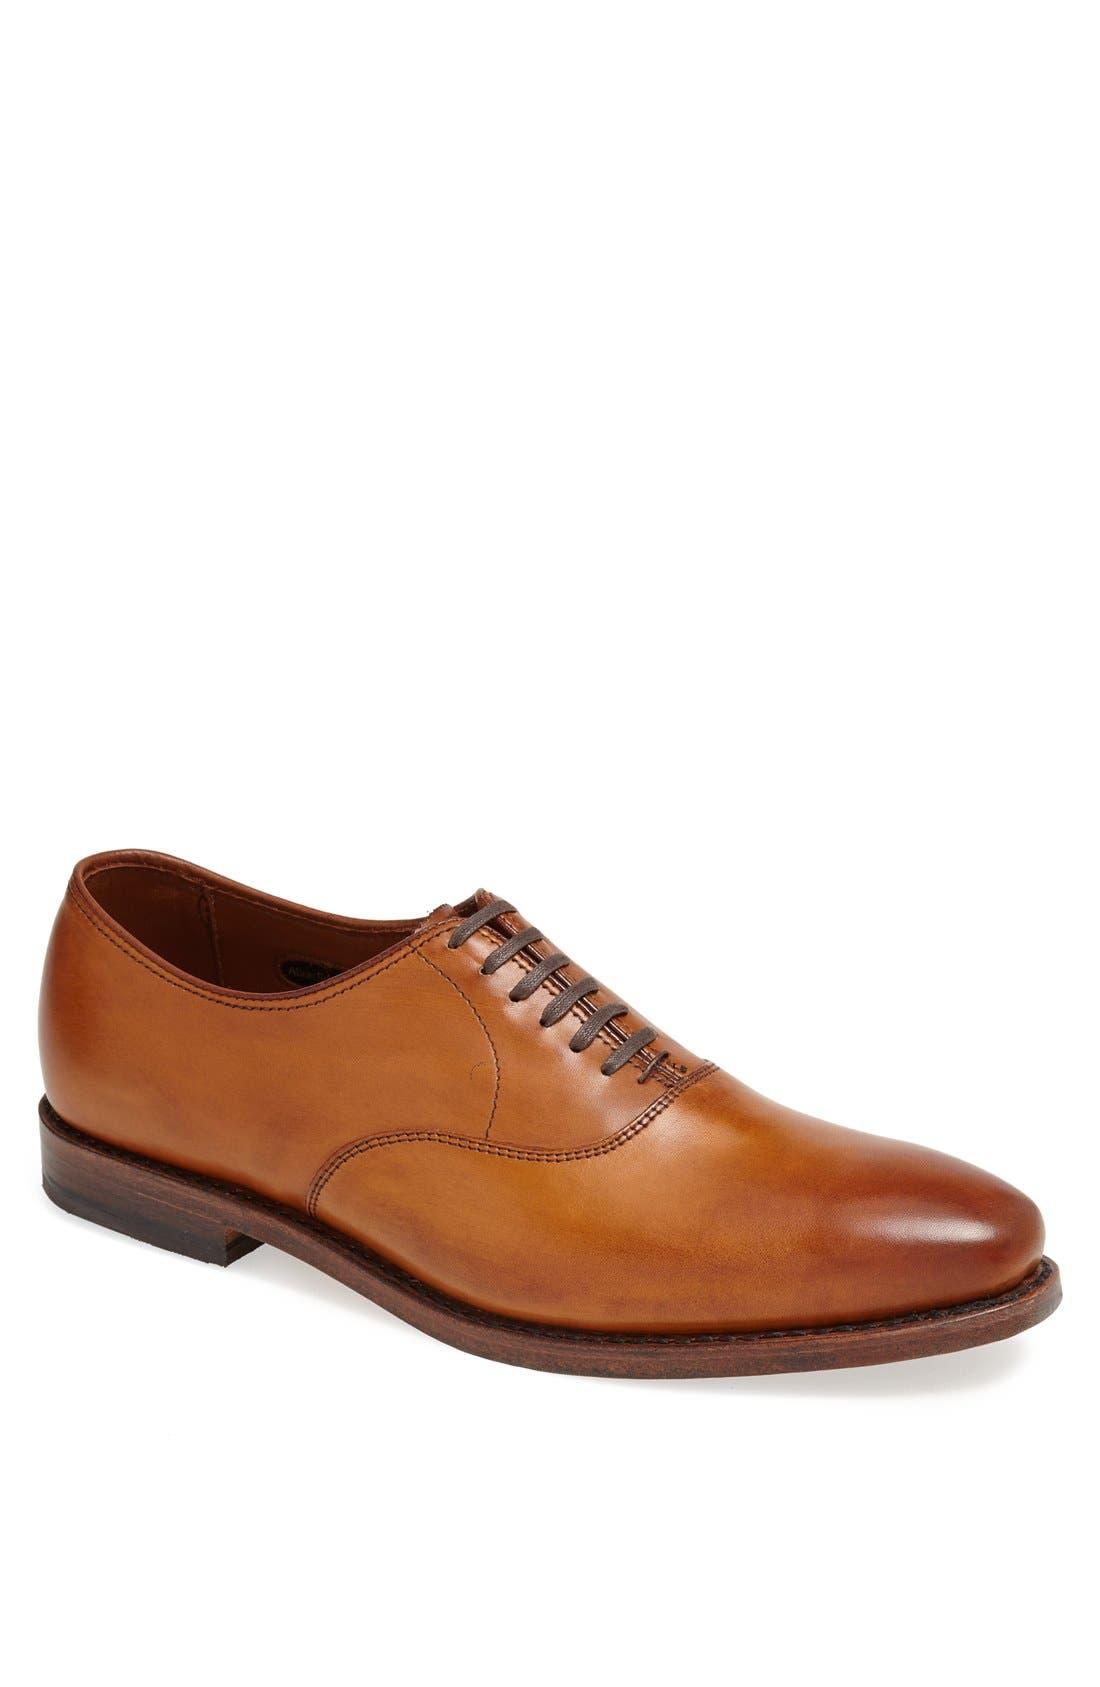 Alternate Image 1 Selected - Allen Edmonds Carlyle Plain Toe Oxford (Men)